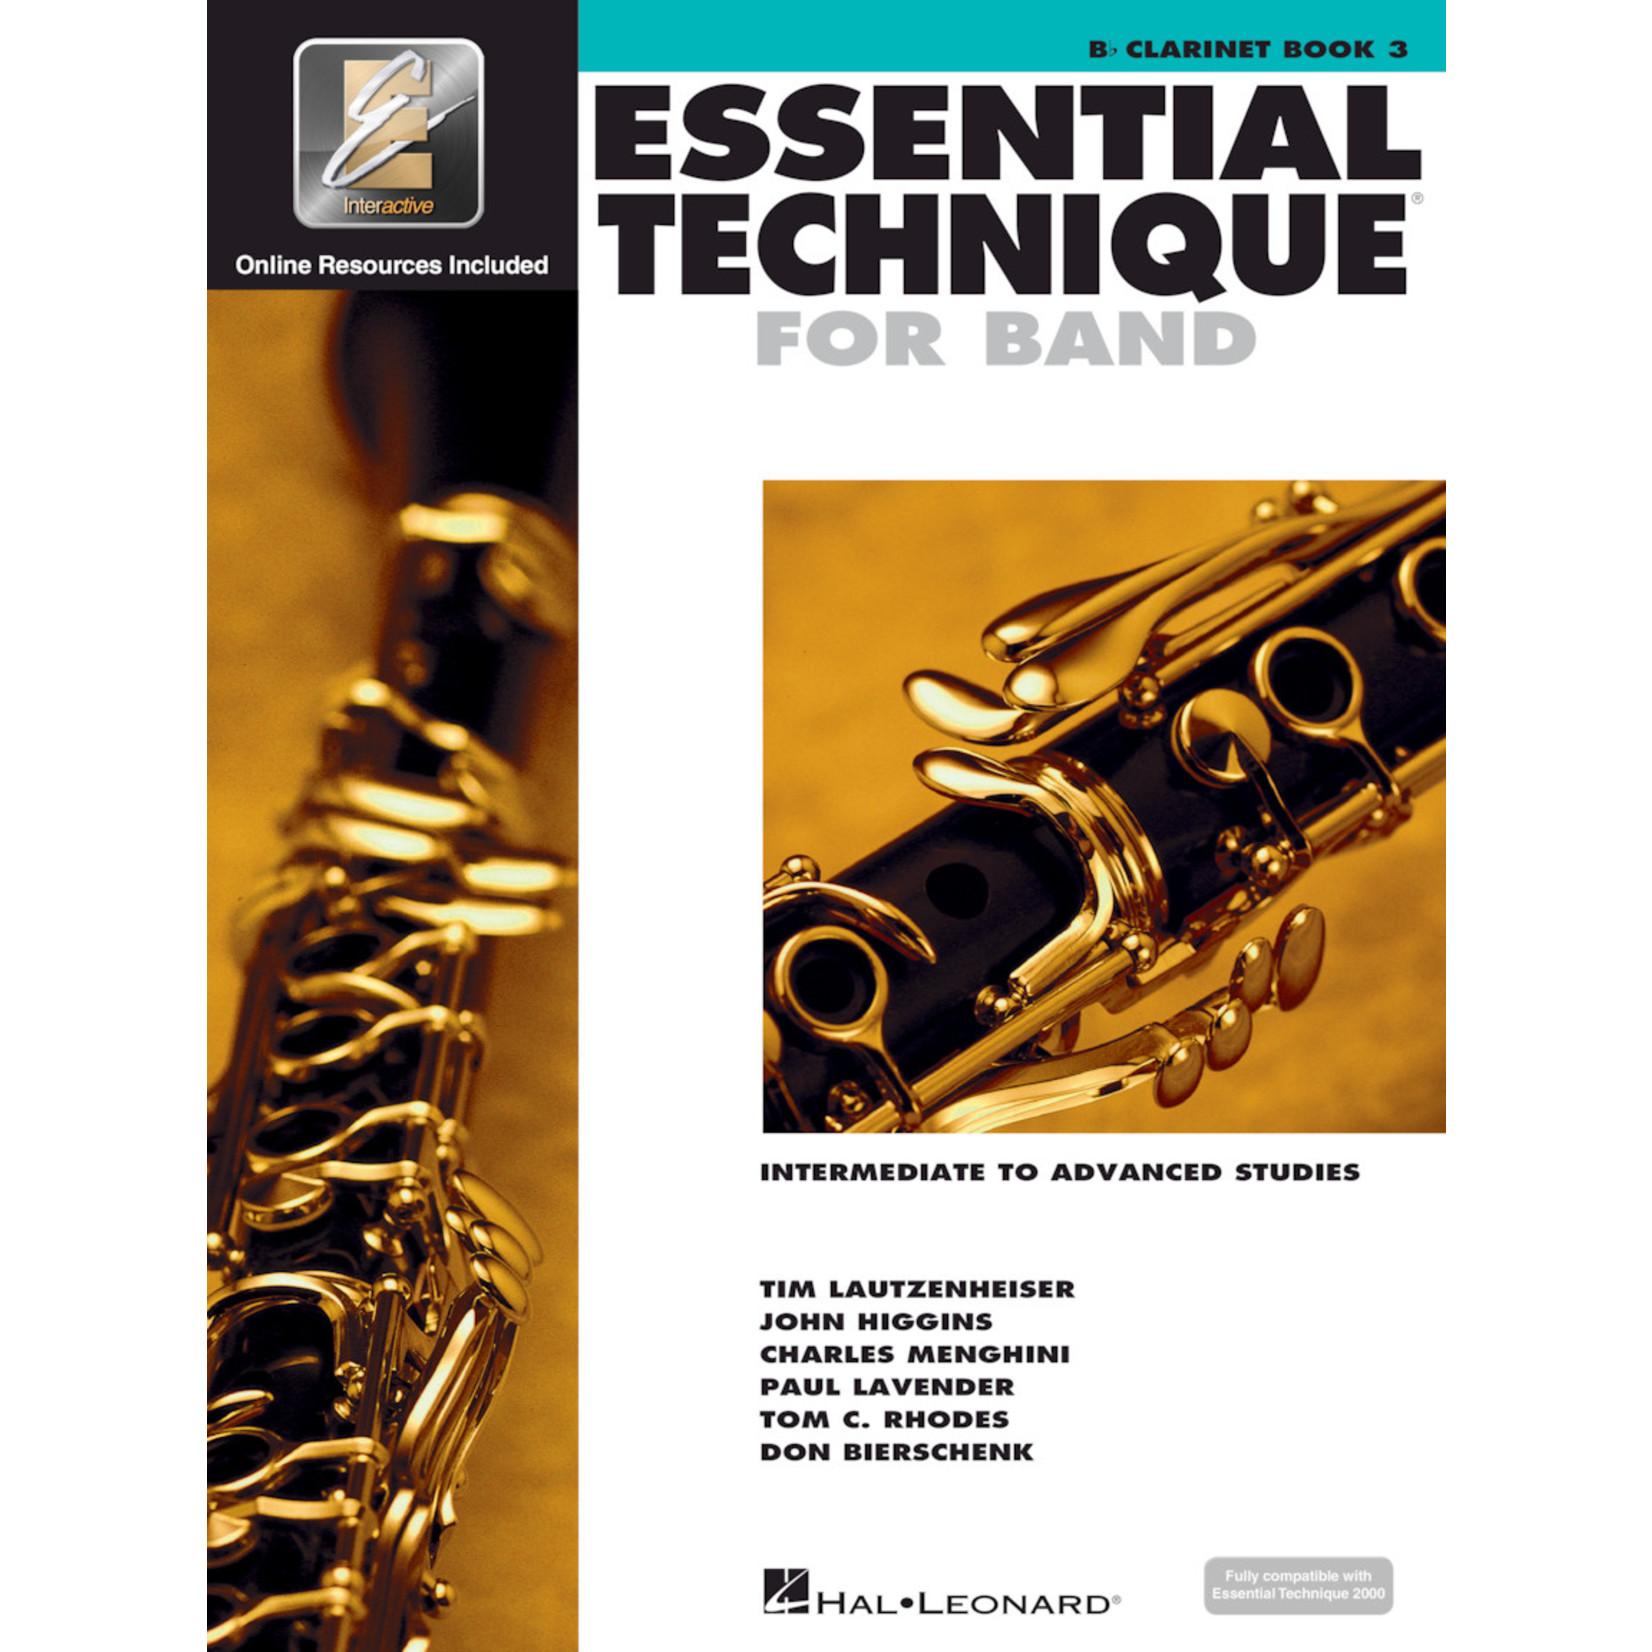 Hal Leonard Essential Technique for Band Clarinet Book 3